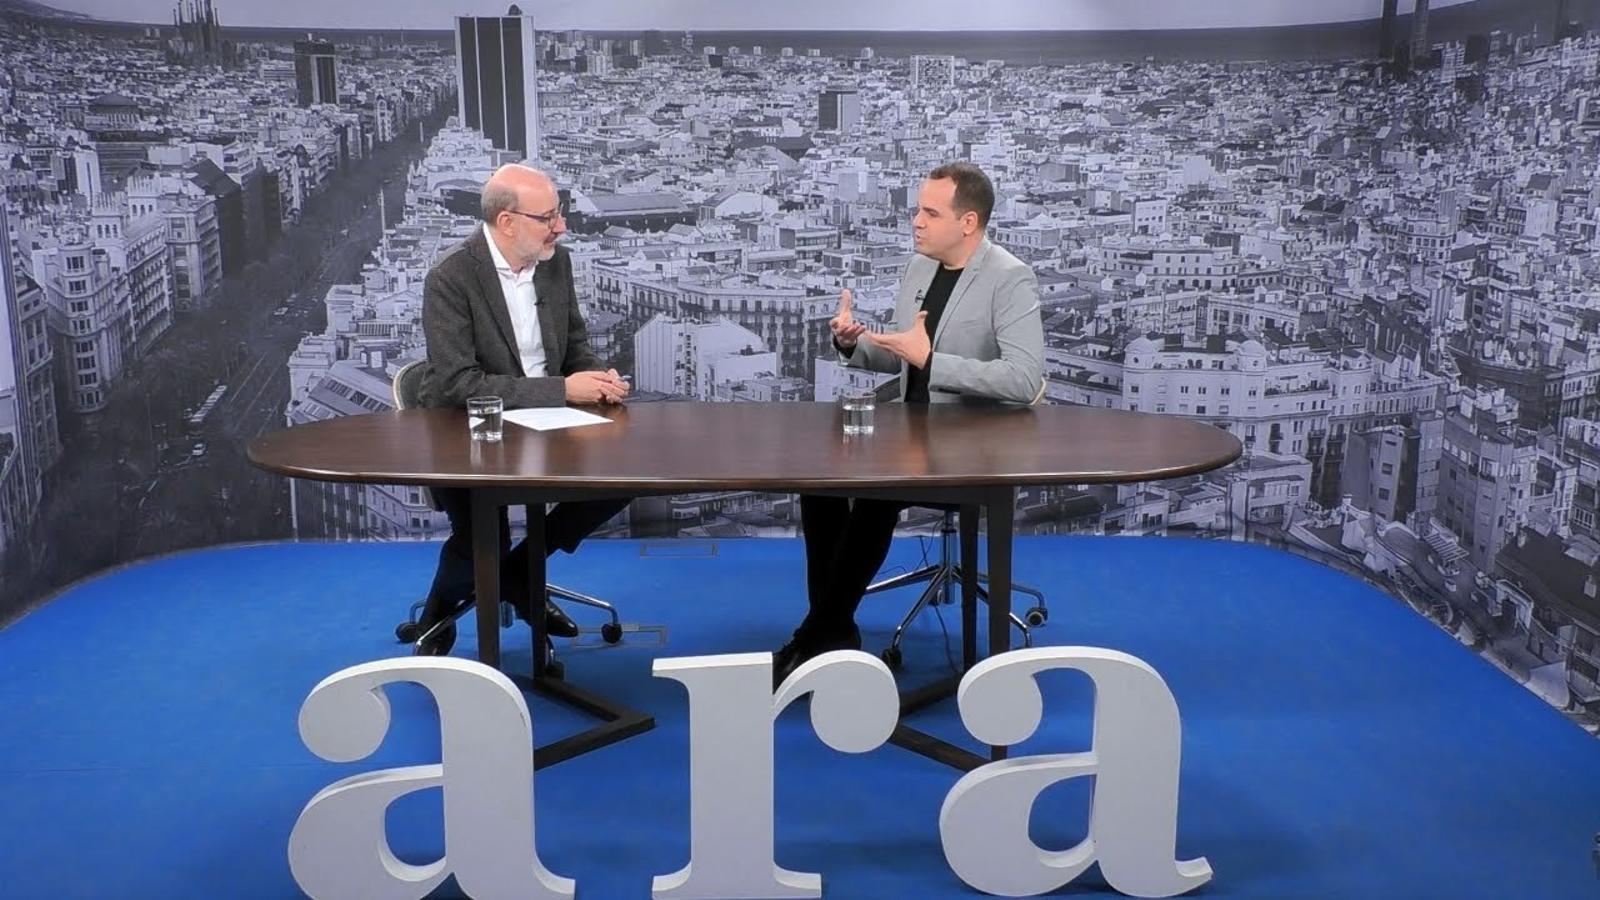 Entrevista d'Antoni Bassas a Albert Quiles